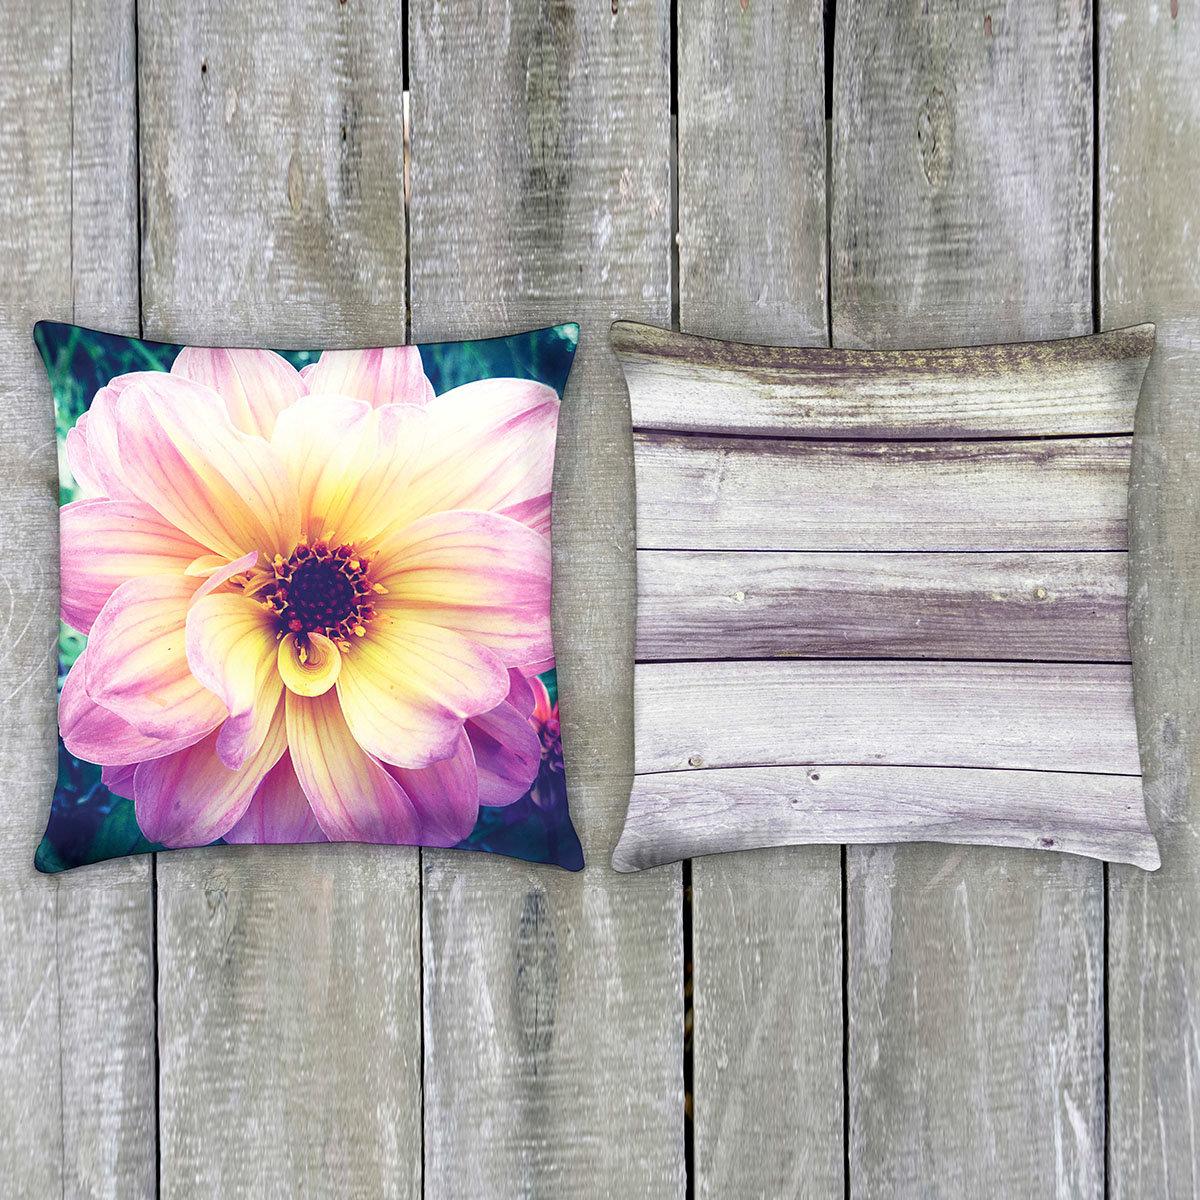 Outdoor-Kissen Holz & Blume